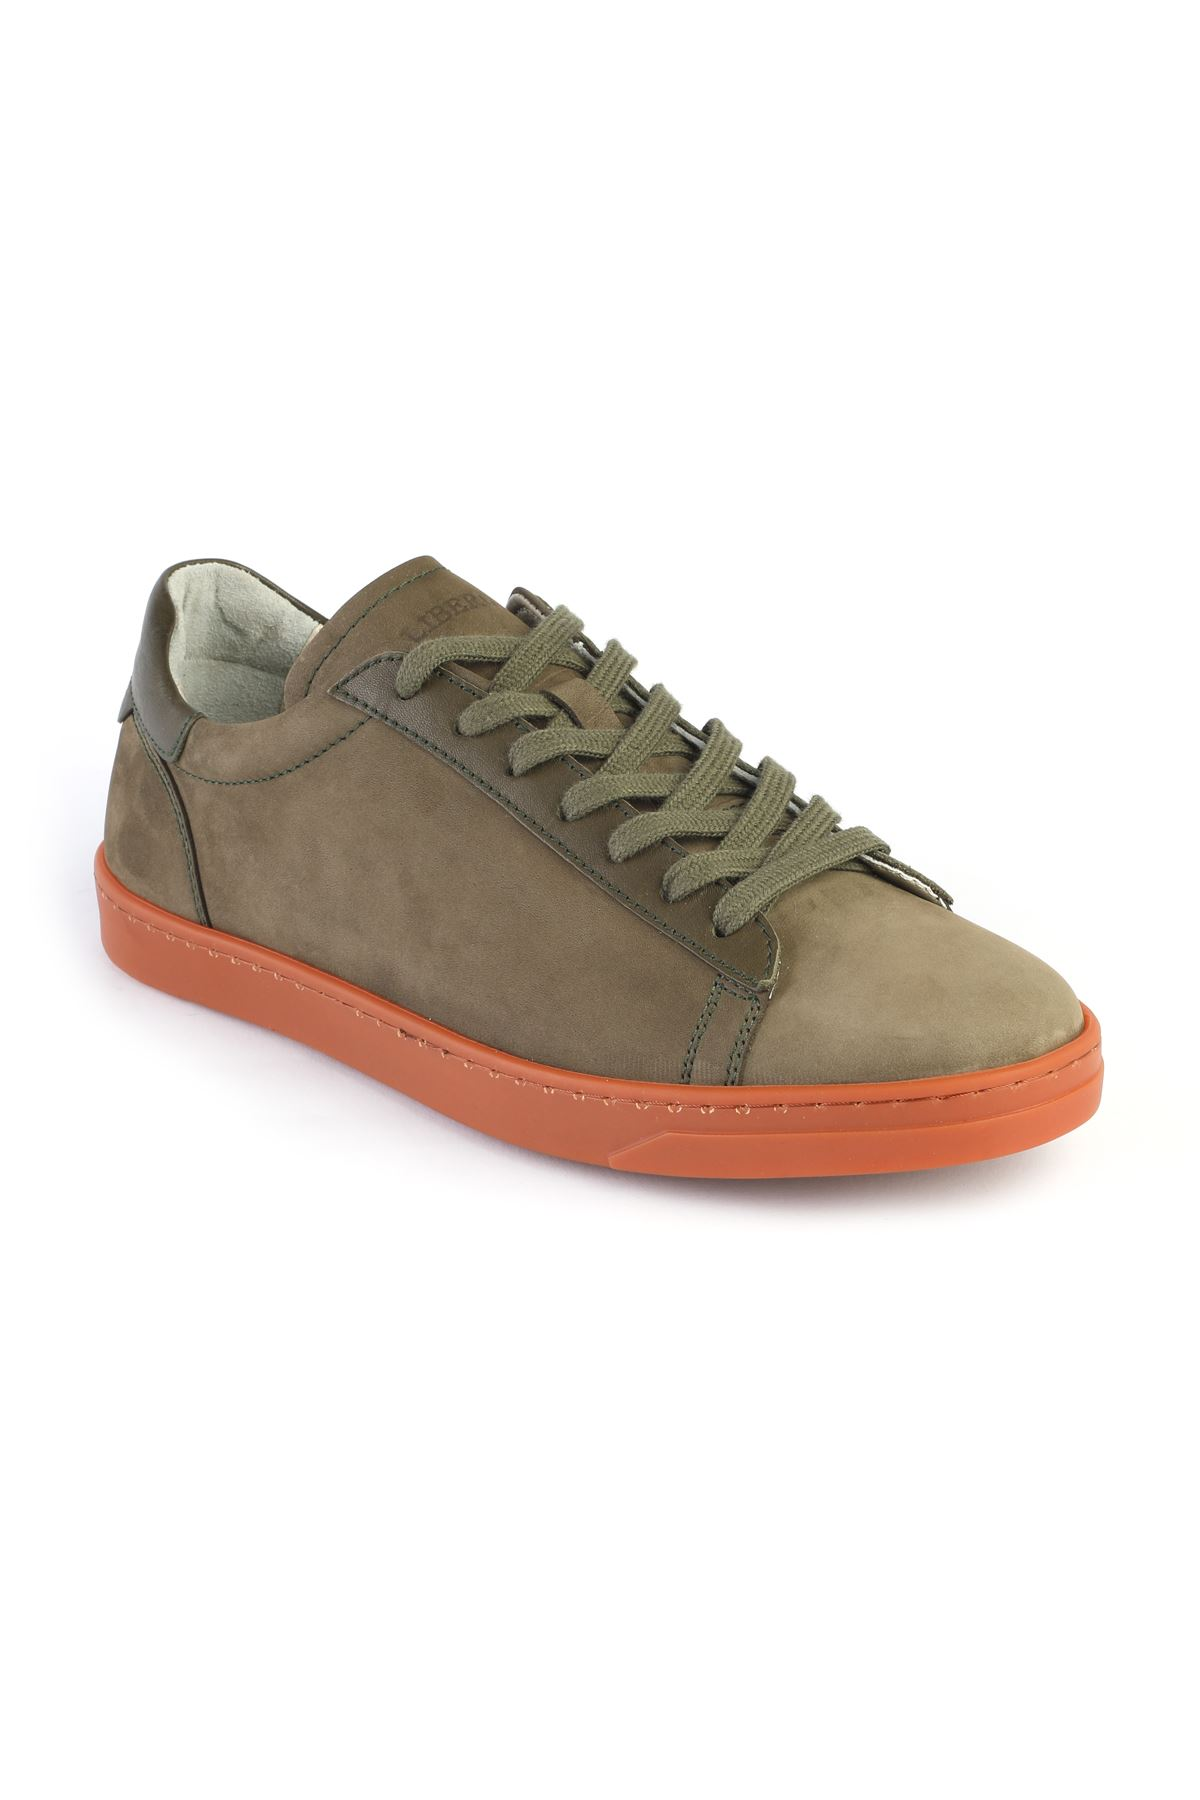 Libero 3419 Khaki Casual Shoes